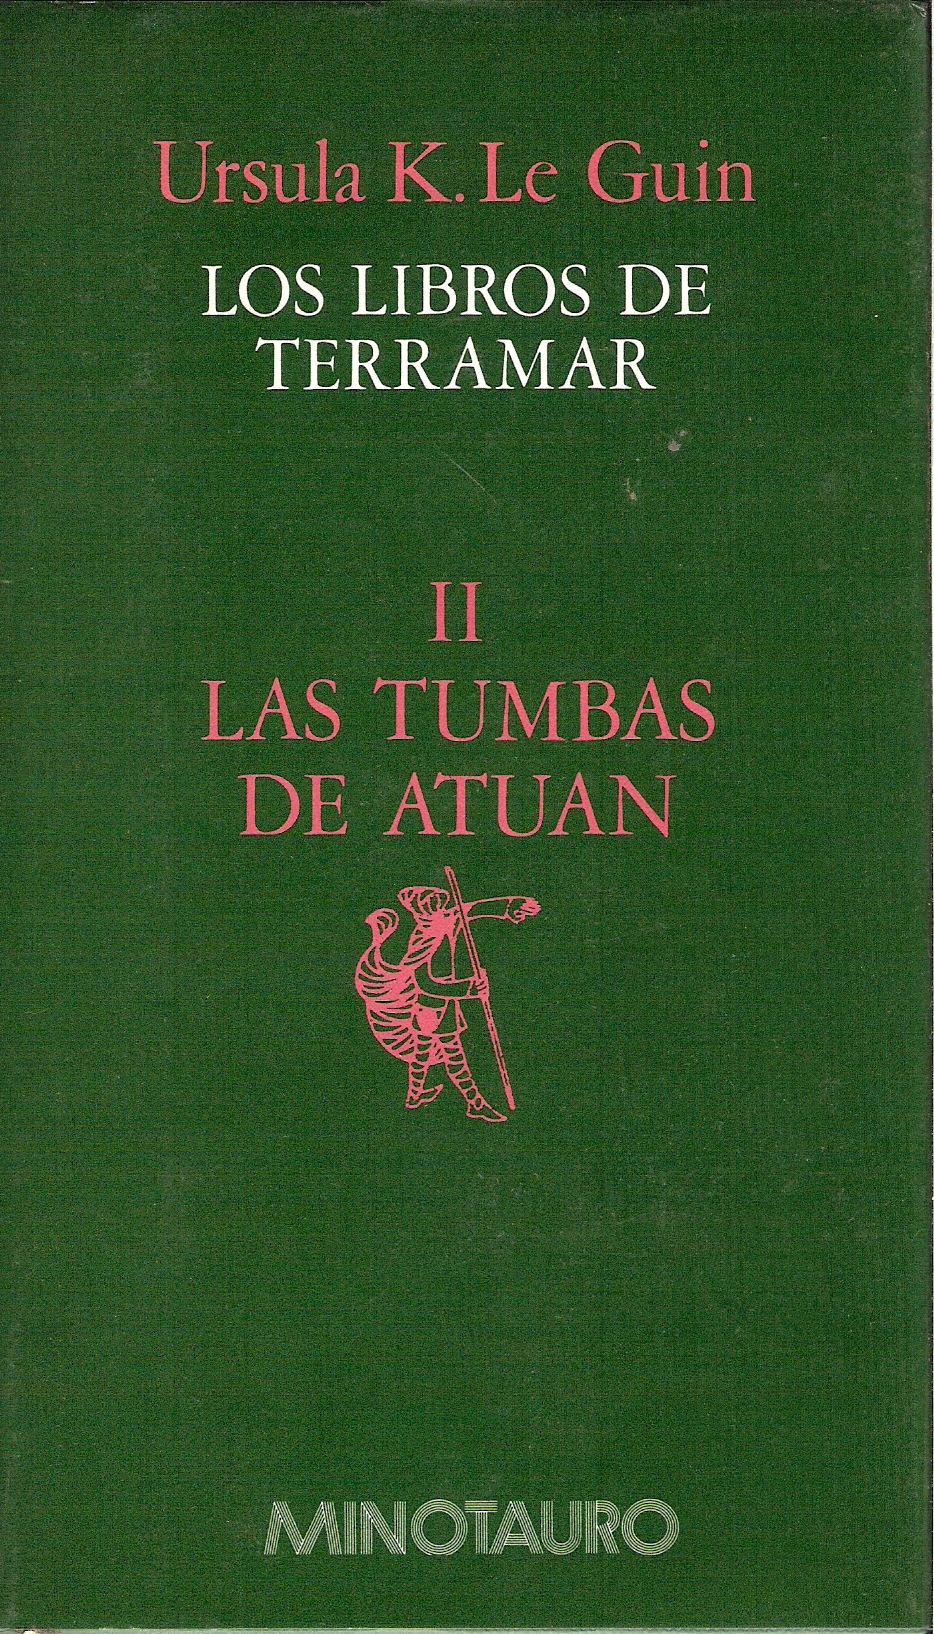 Las tumbas de Atuan